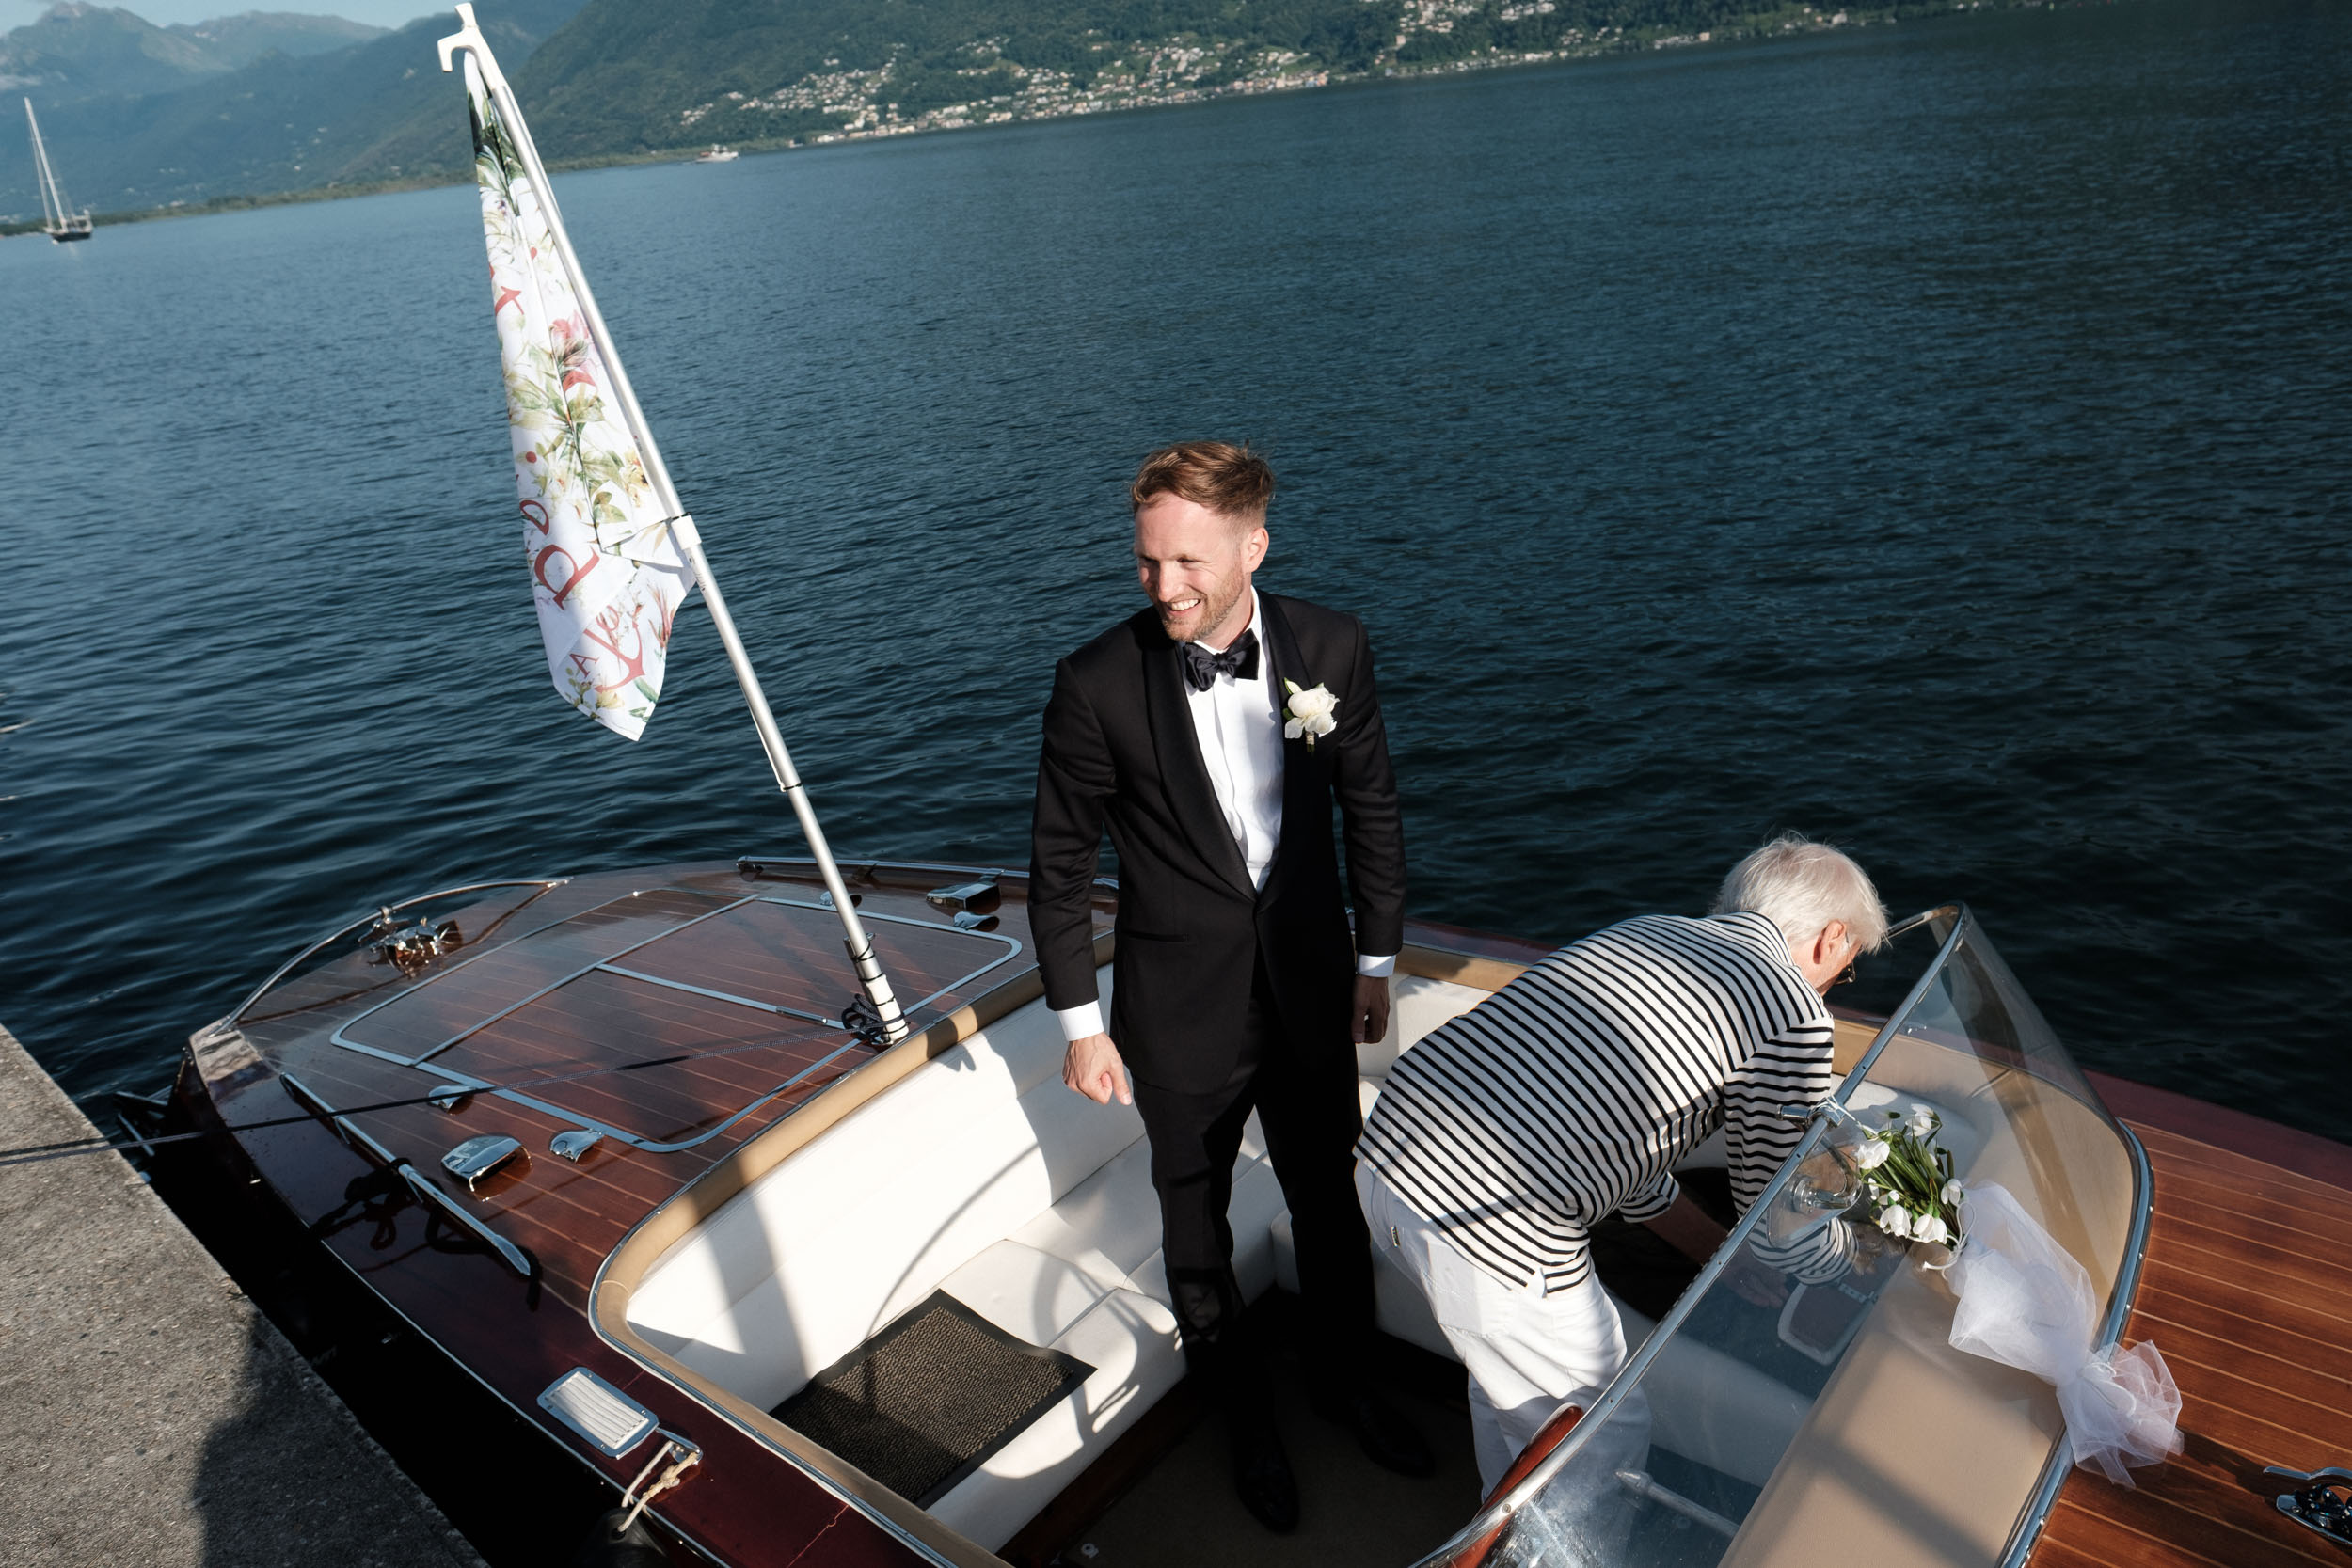 olivia-andreas-wedding-switzerland-446.jpg